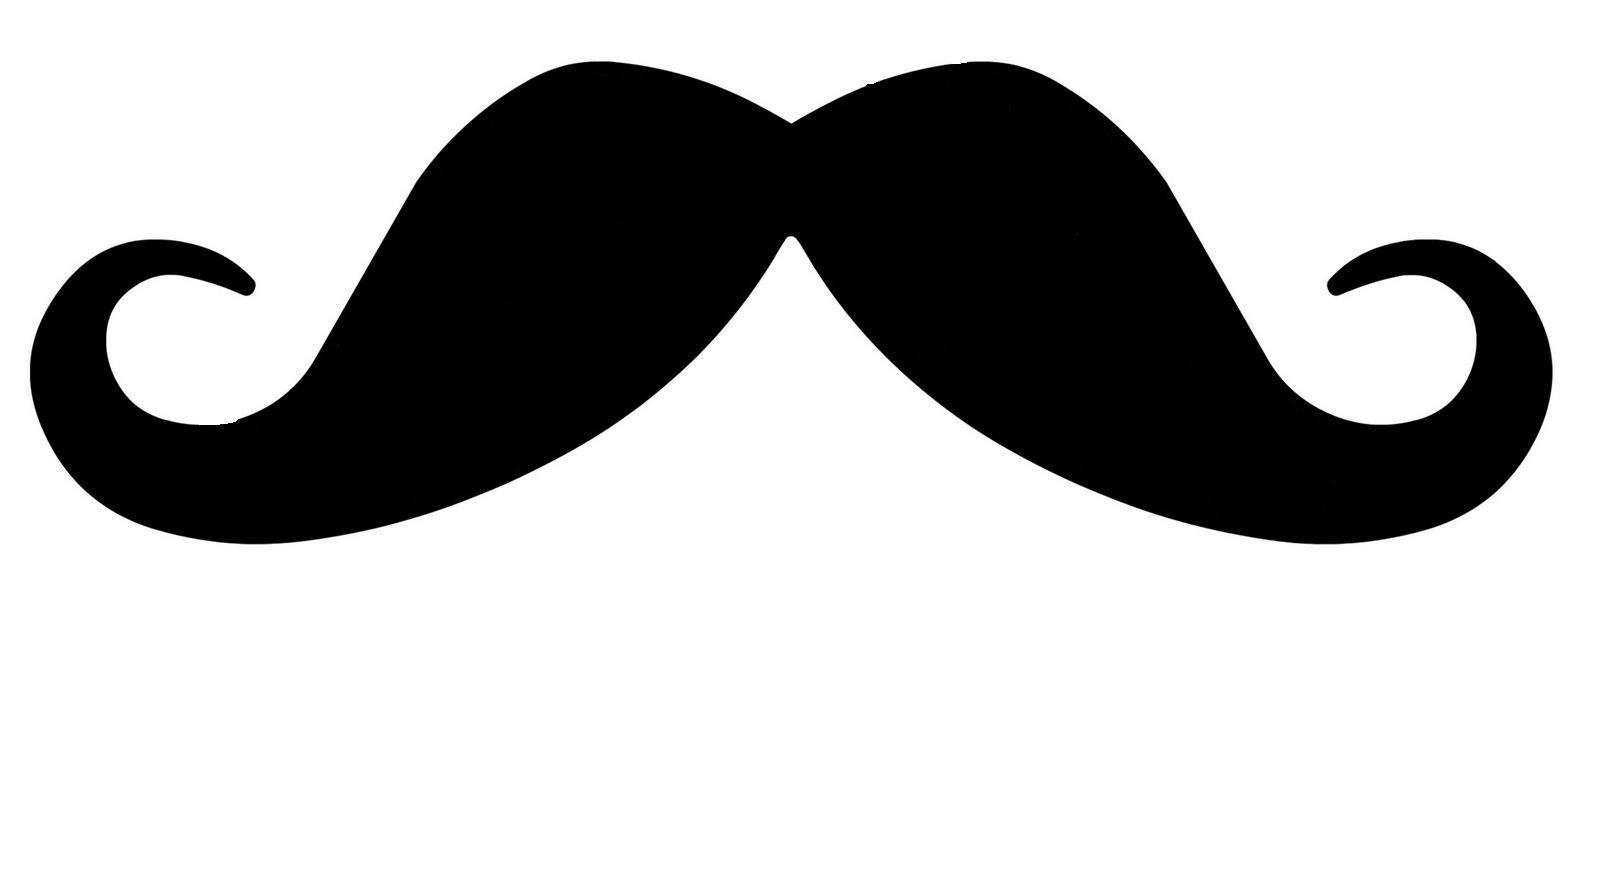 Moustache clipart handlebar mustache. Outline cliparting com